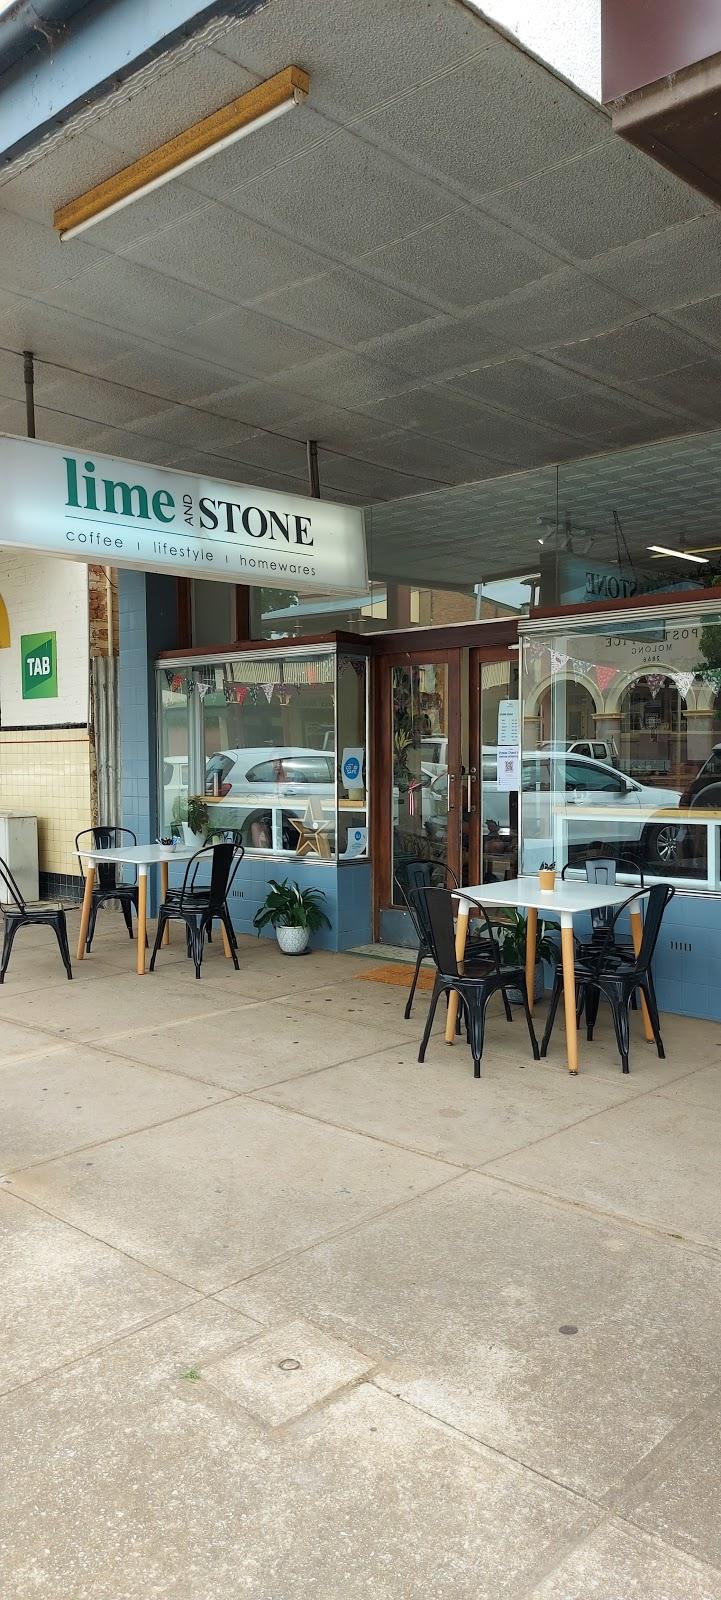 Lime and Stone Molong   food   47 Bank St, Molong NSW 2866, Australia   0422793454 OR +61 422 793 454